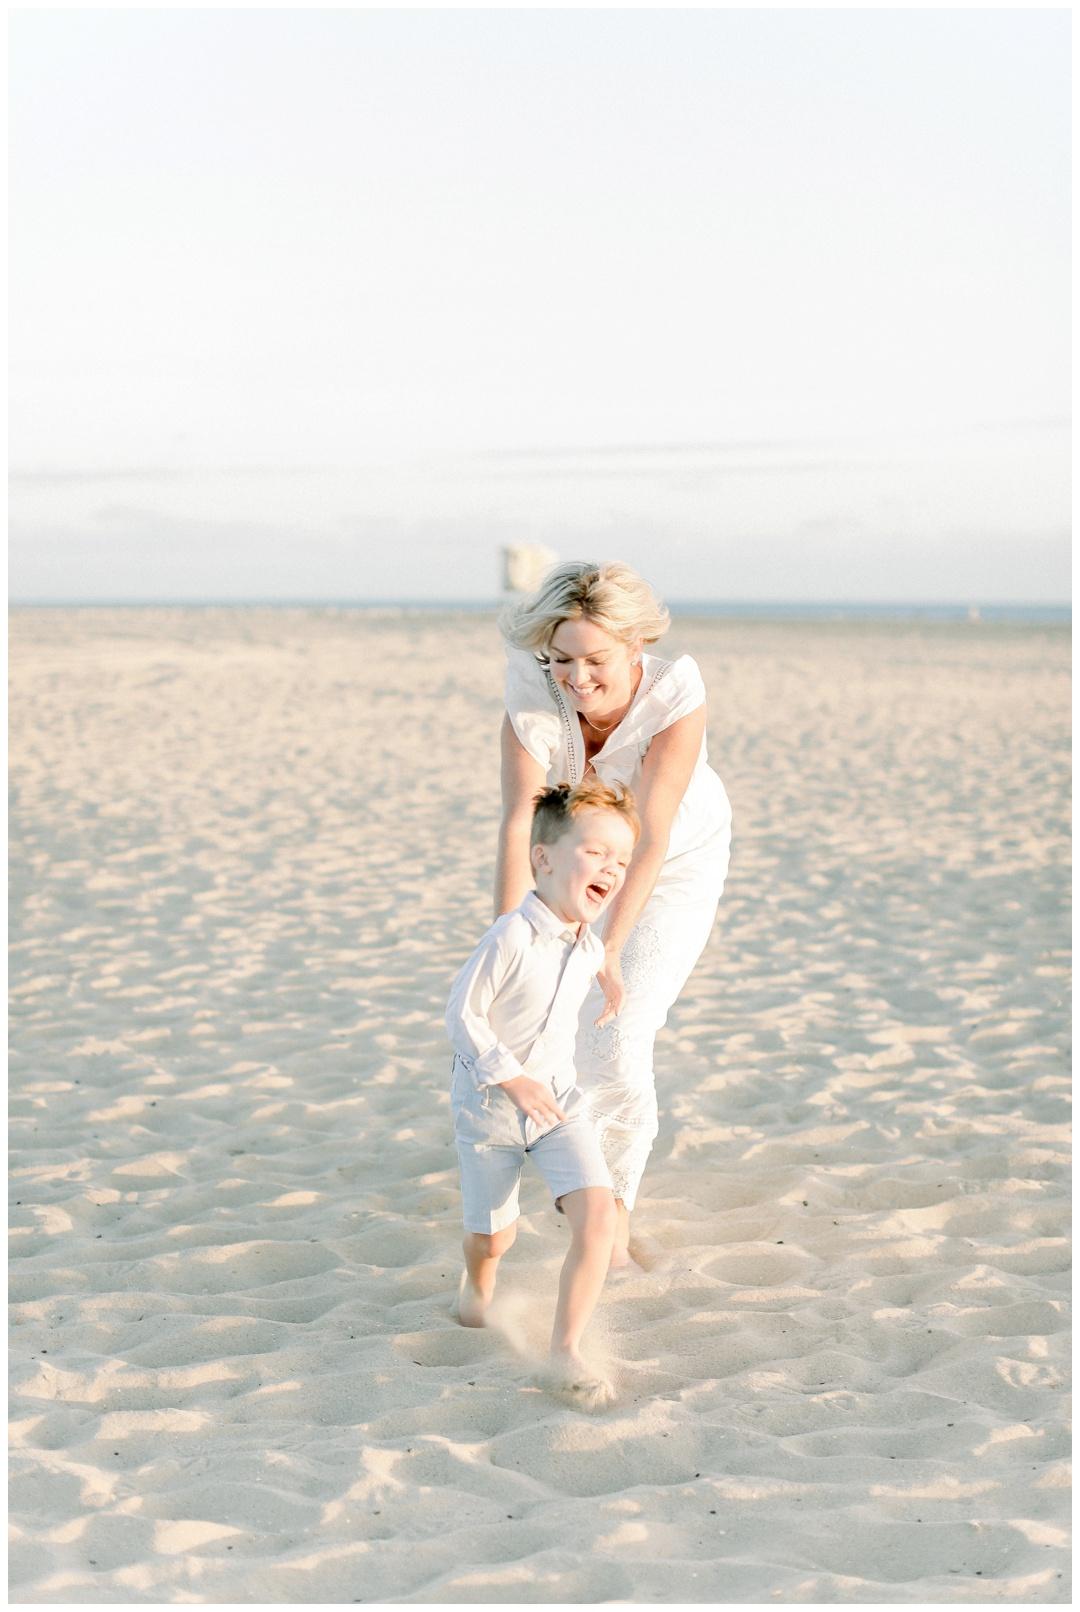 Newport_Beach_Family_Photographer_Newport_Beach_Newborn_Photographer_Orange_County_Family_Photographer_Cori_Kleckner_Photography_Huntington_Beach_San_Clemente_Family_Session_Photography__2351.jpg